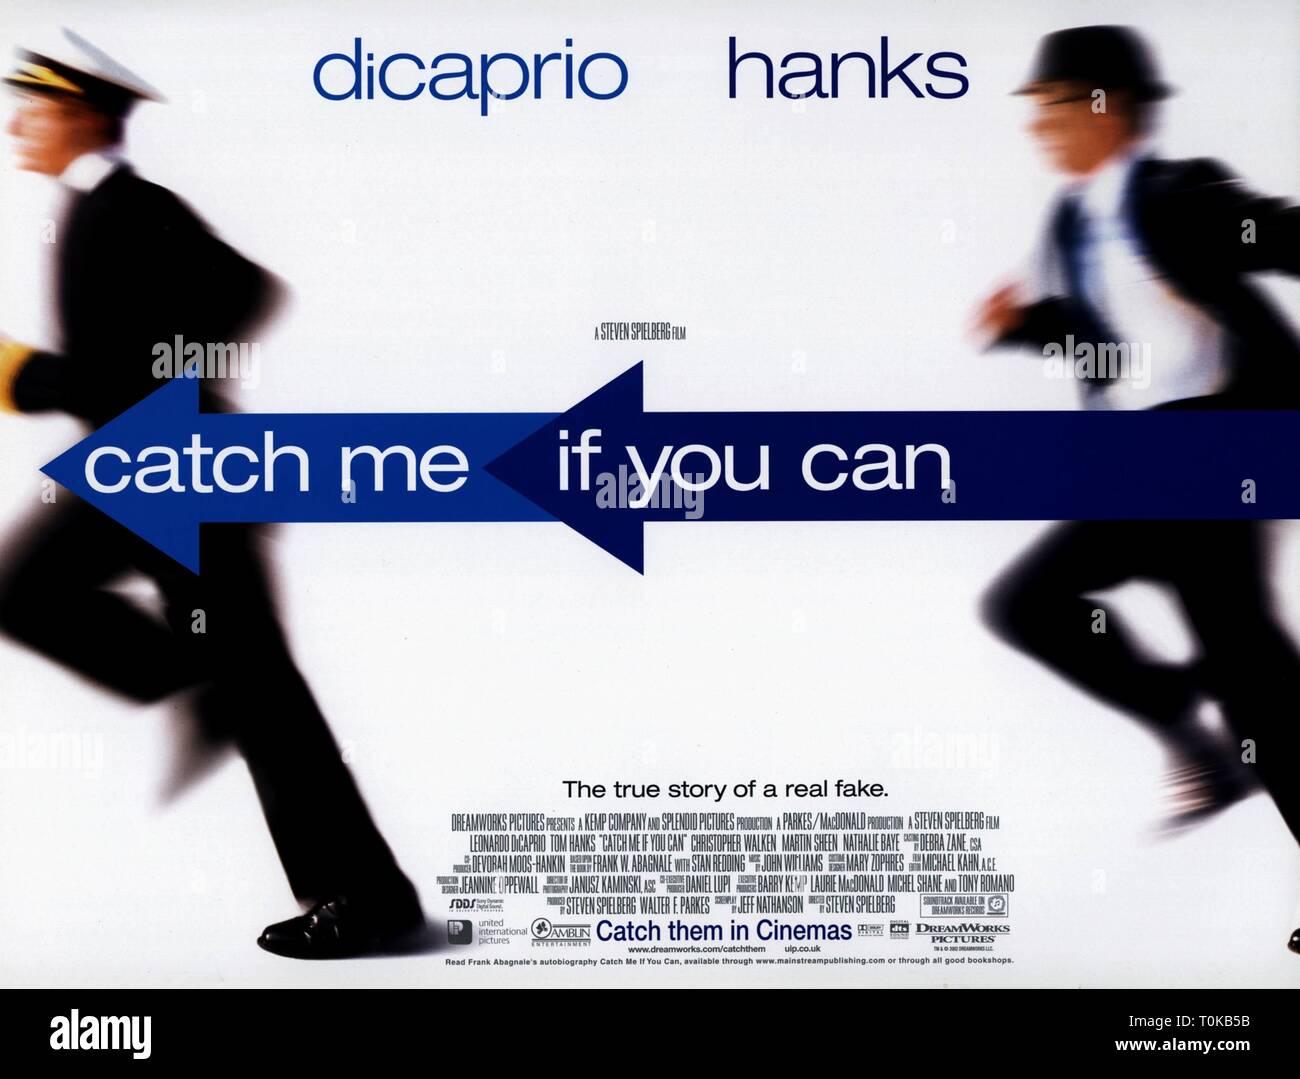 Leonardo Dicaprio Tom Hanks Poster Catch Me If You Can 2002 Stock Photo Alamy